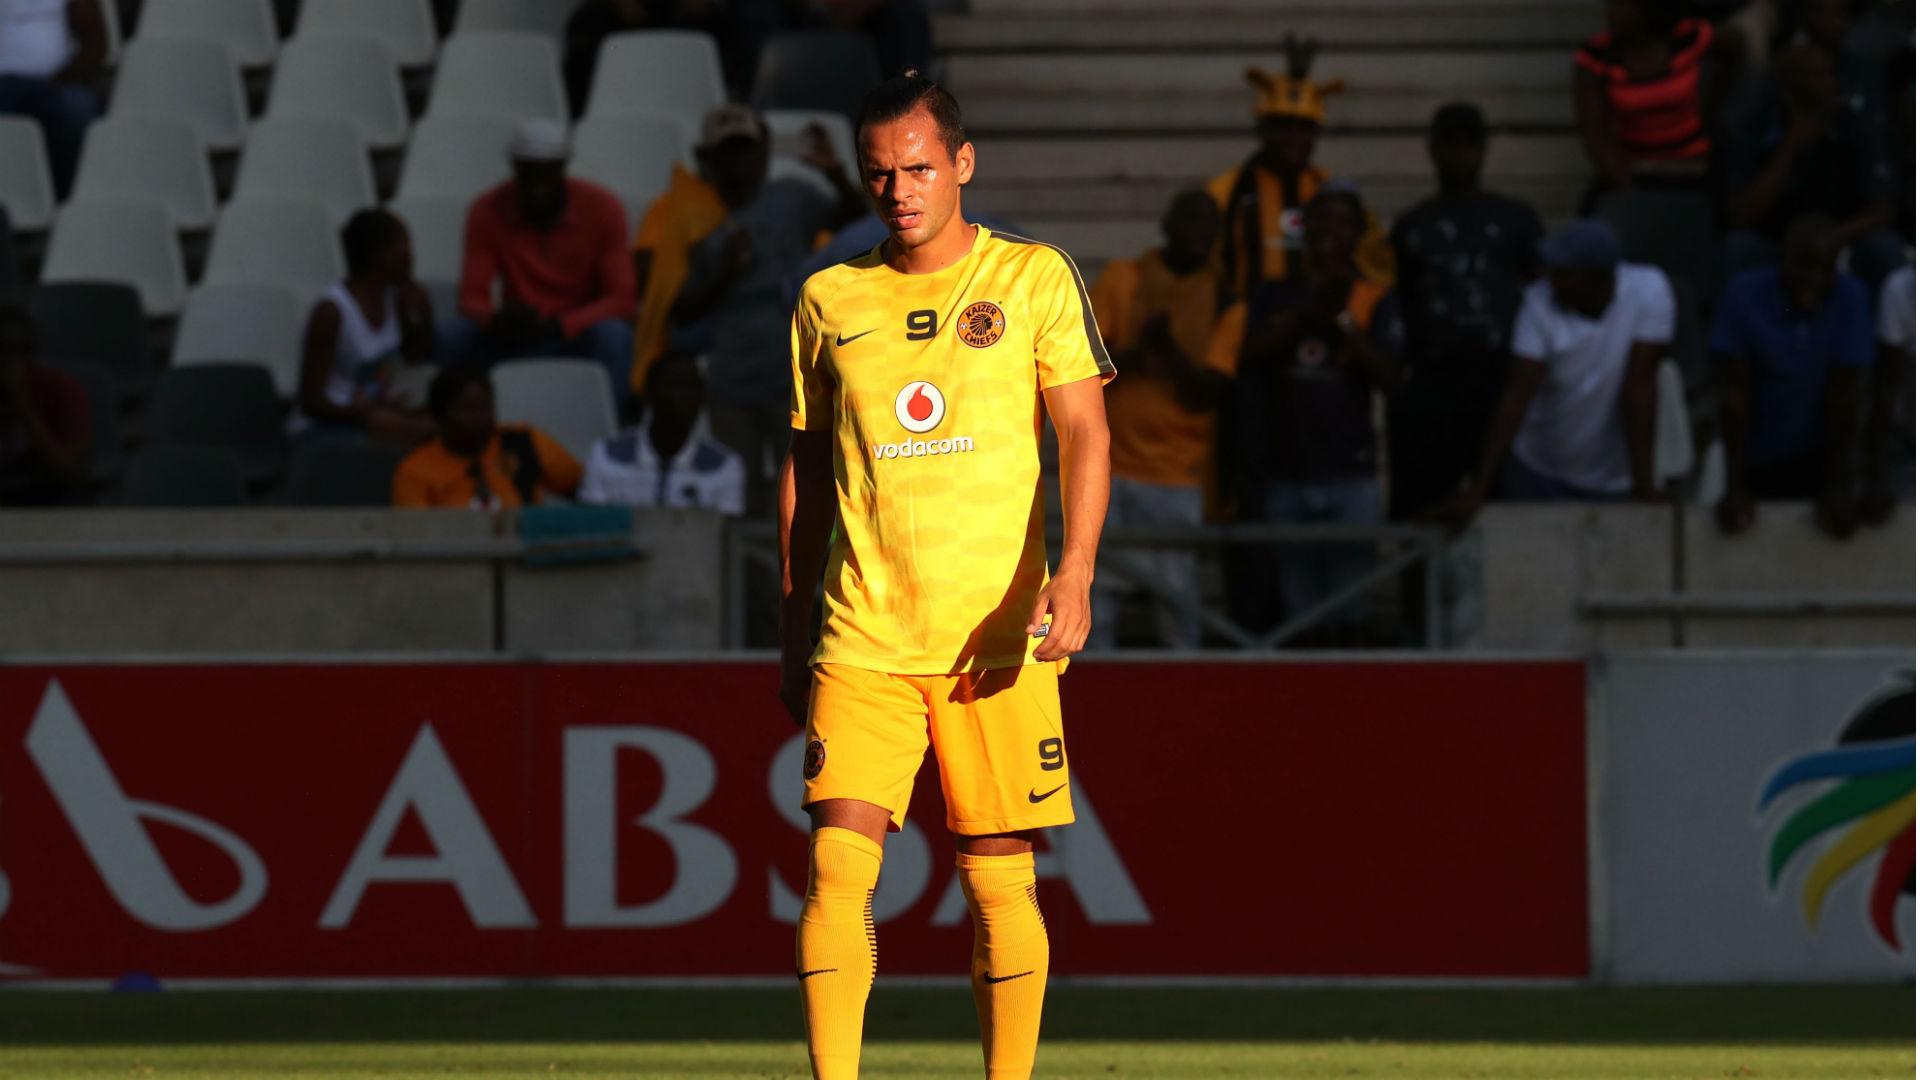 Former Kaizer Chiefs striker Paez and ex-Mamelodi Sundowns forward Ngele headline new TTM signings